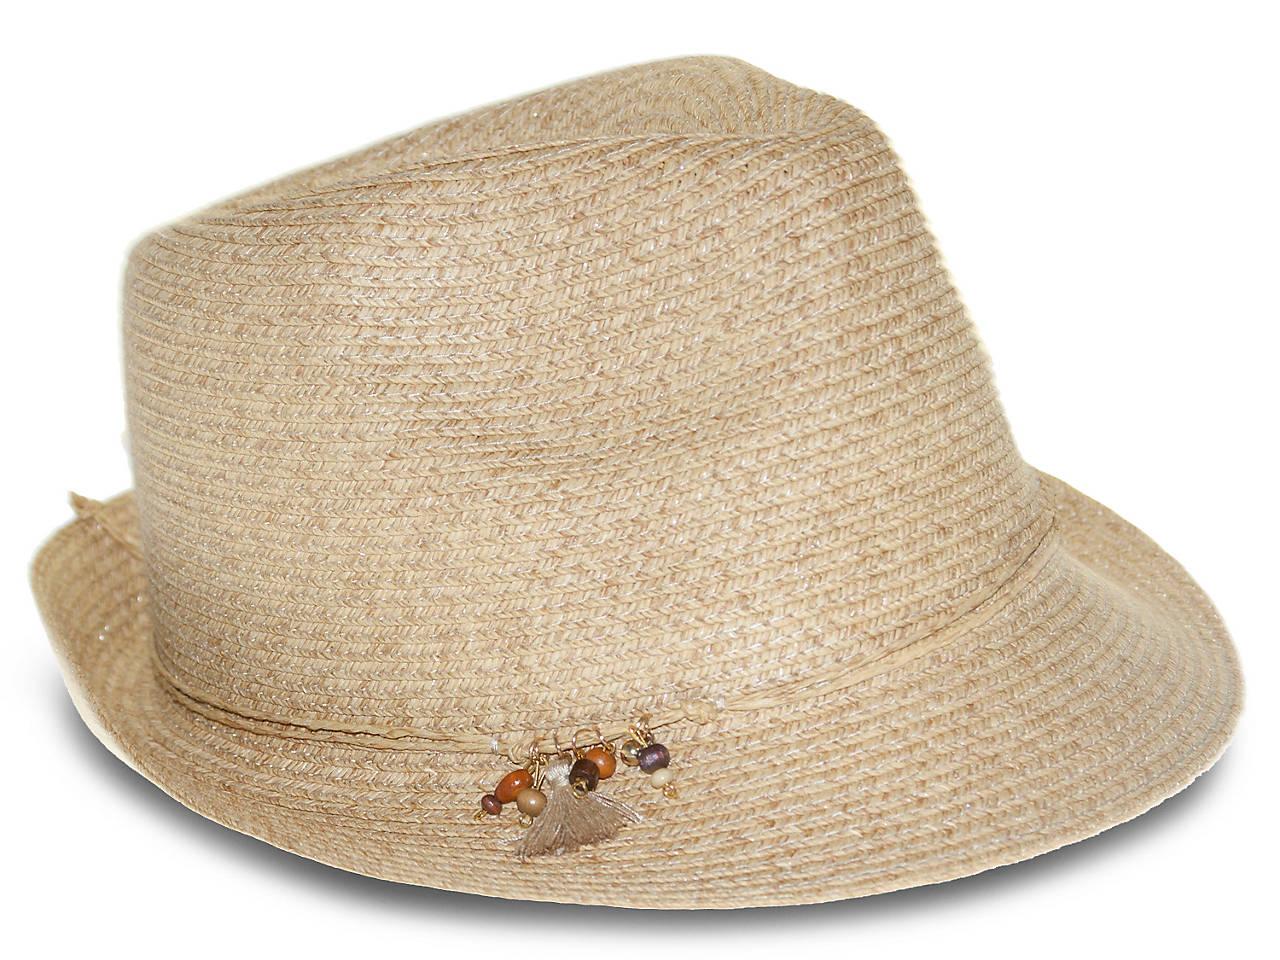 7c30ae61397f1 Nine West Packable Fedora Hat Women s Handbags   Accessories